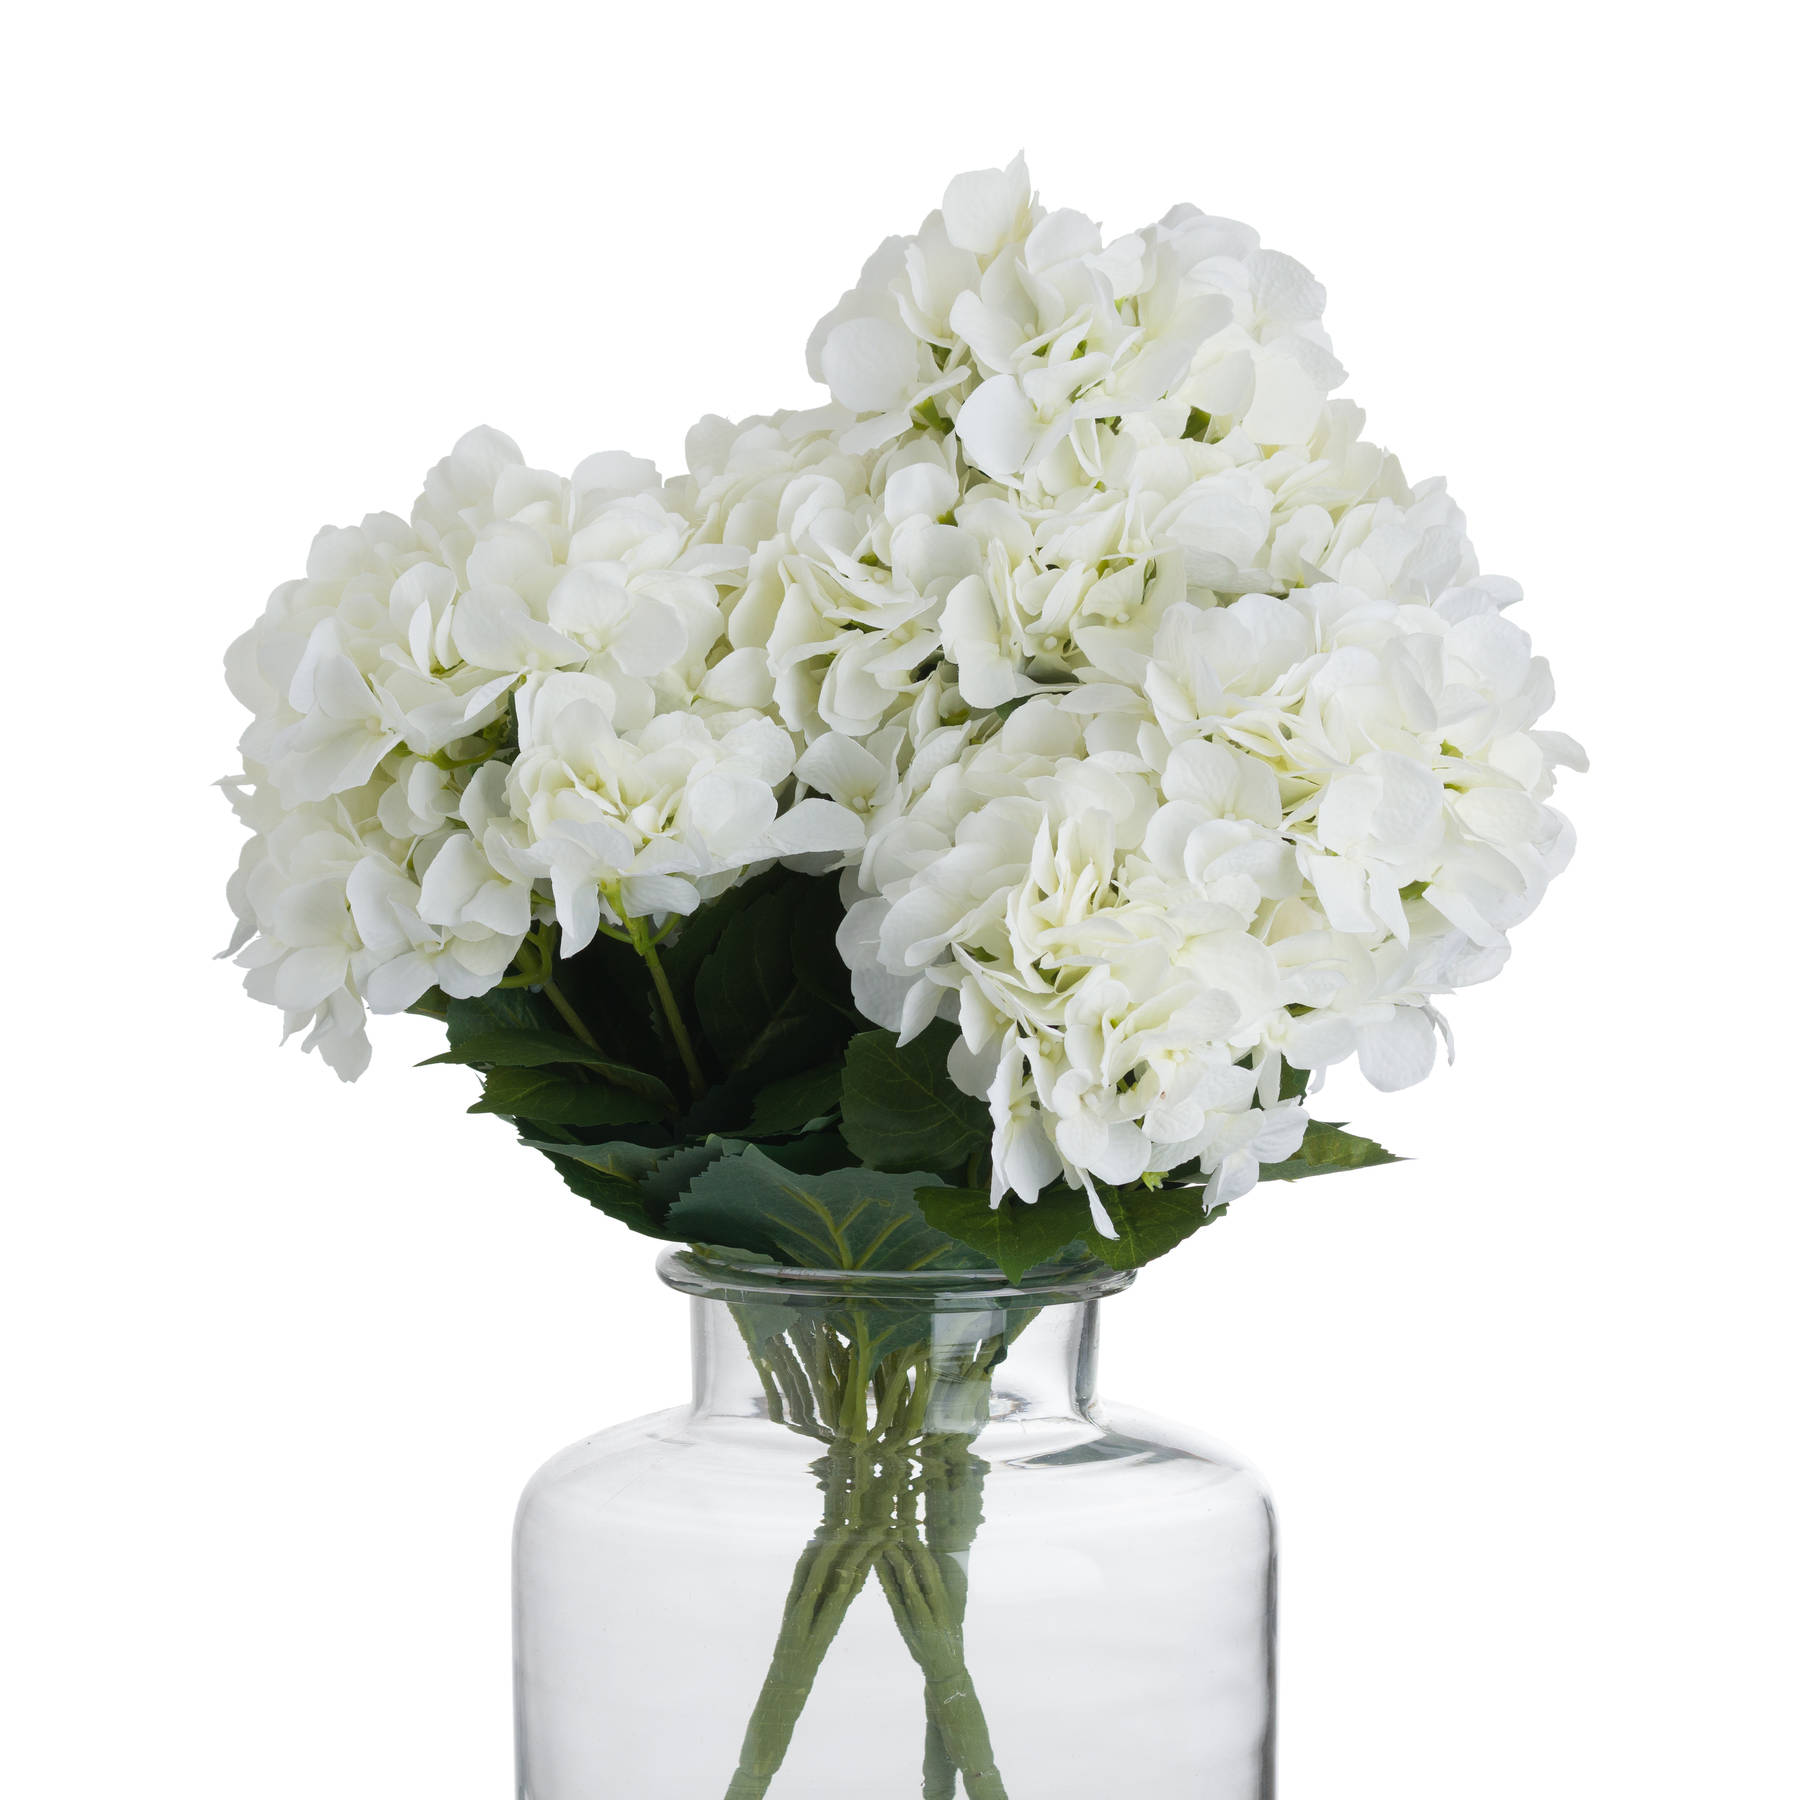 White Hydrangea Bouquet - Image 4